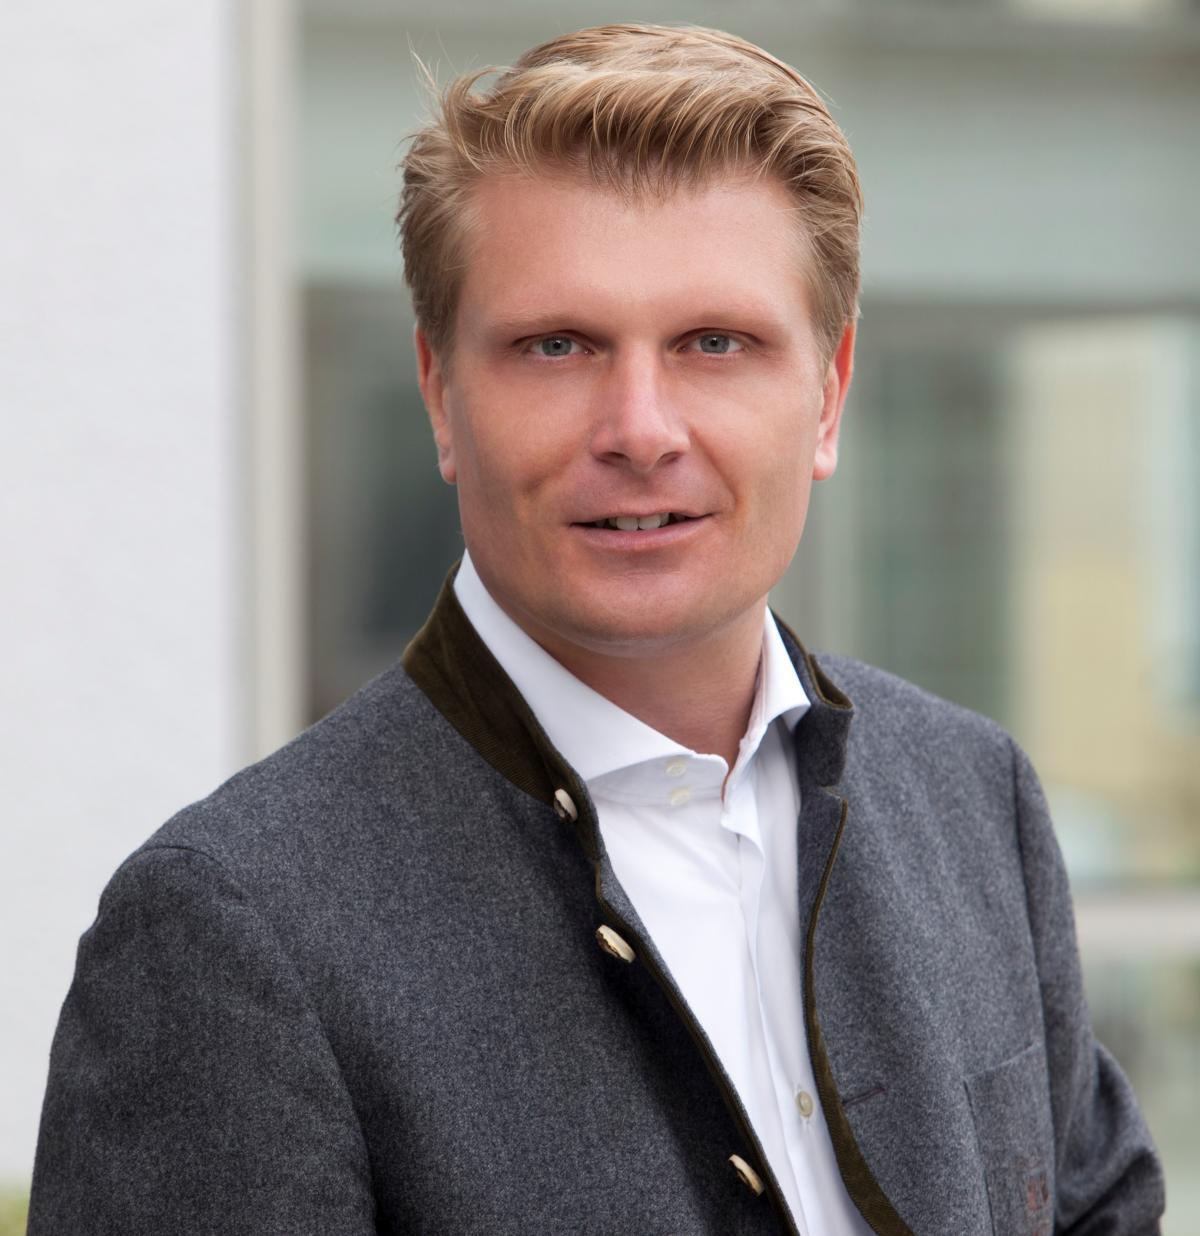 Thomas Bareiß, Member of the German Bundestag and Representative for Energy Policy of the CDU/CSU Parliamentary Group, 2016.